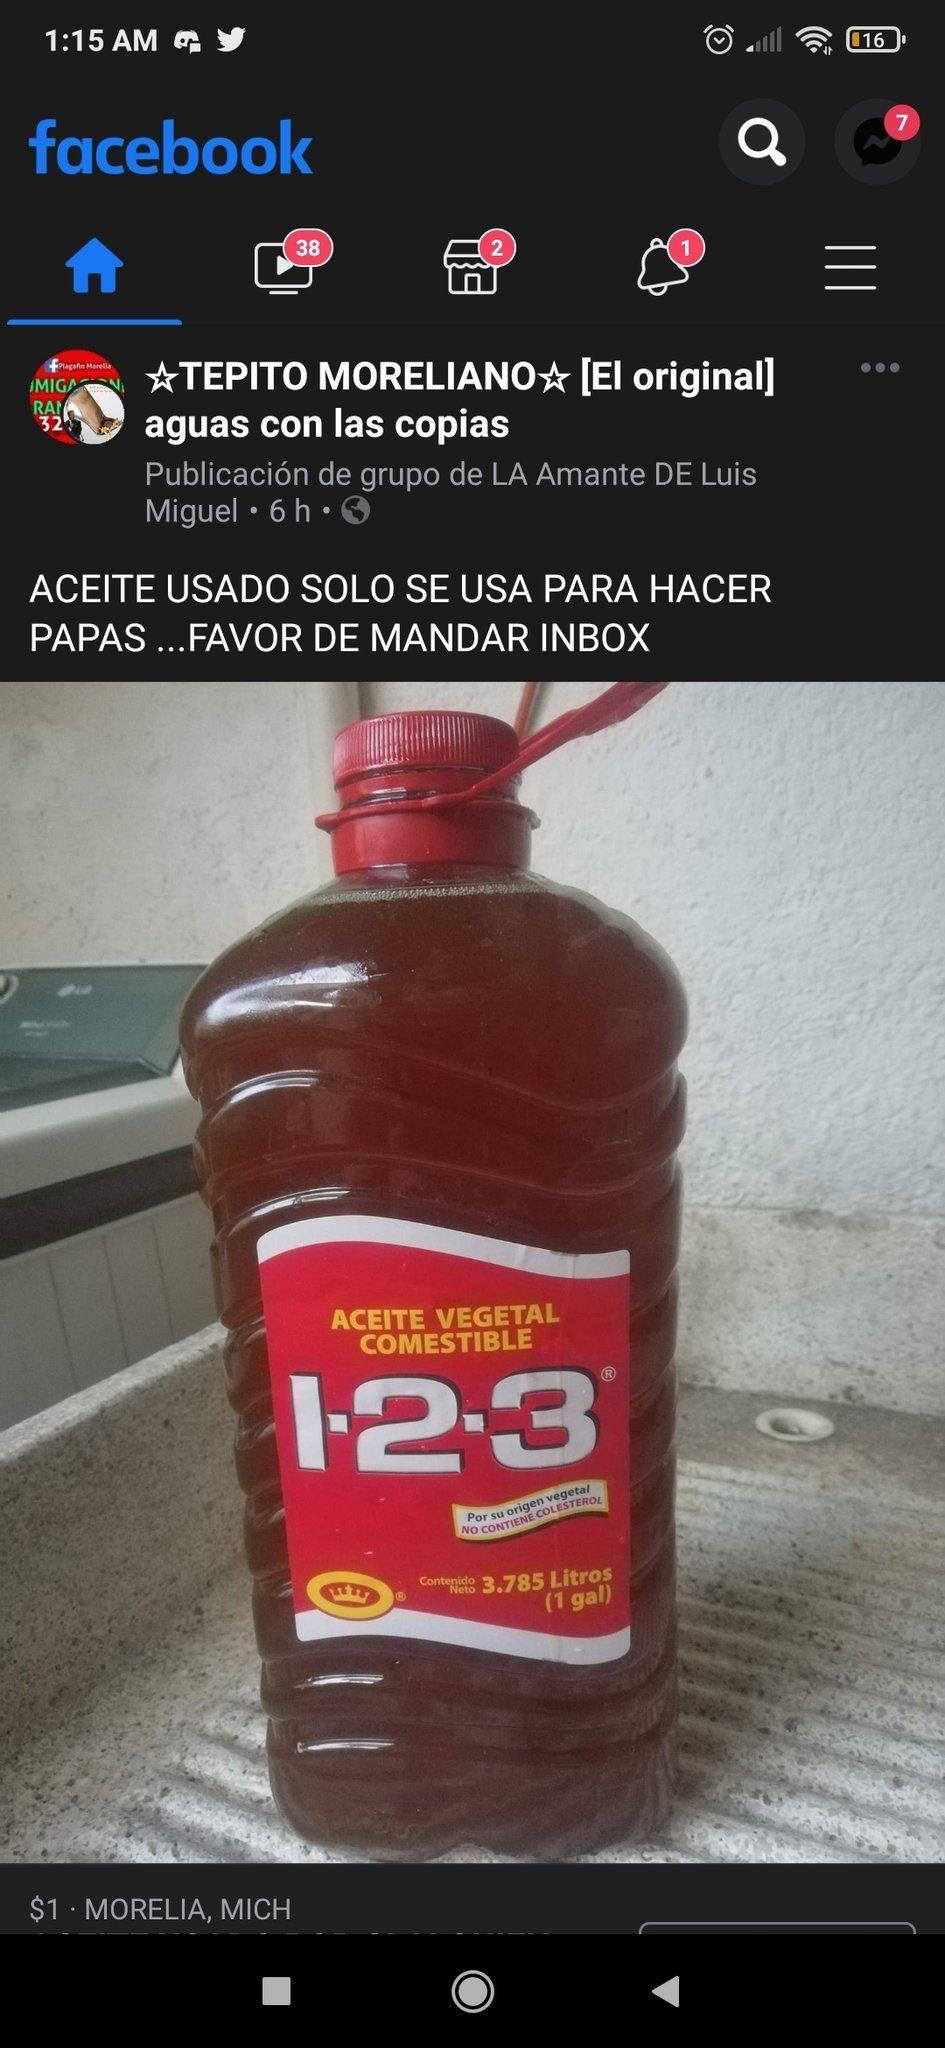 se vende aceite usado - meme